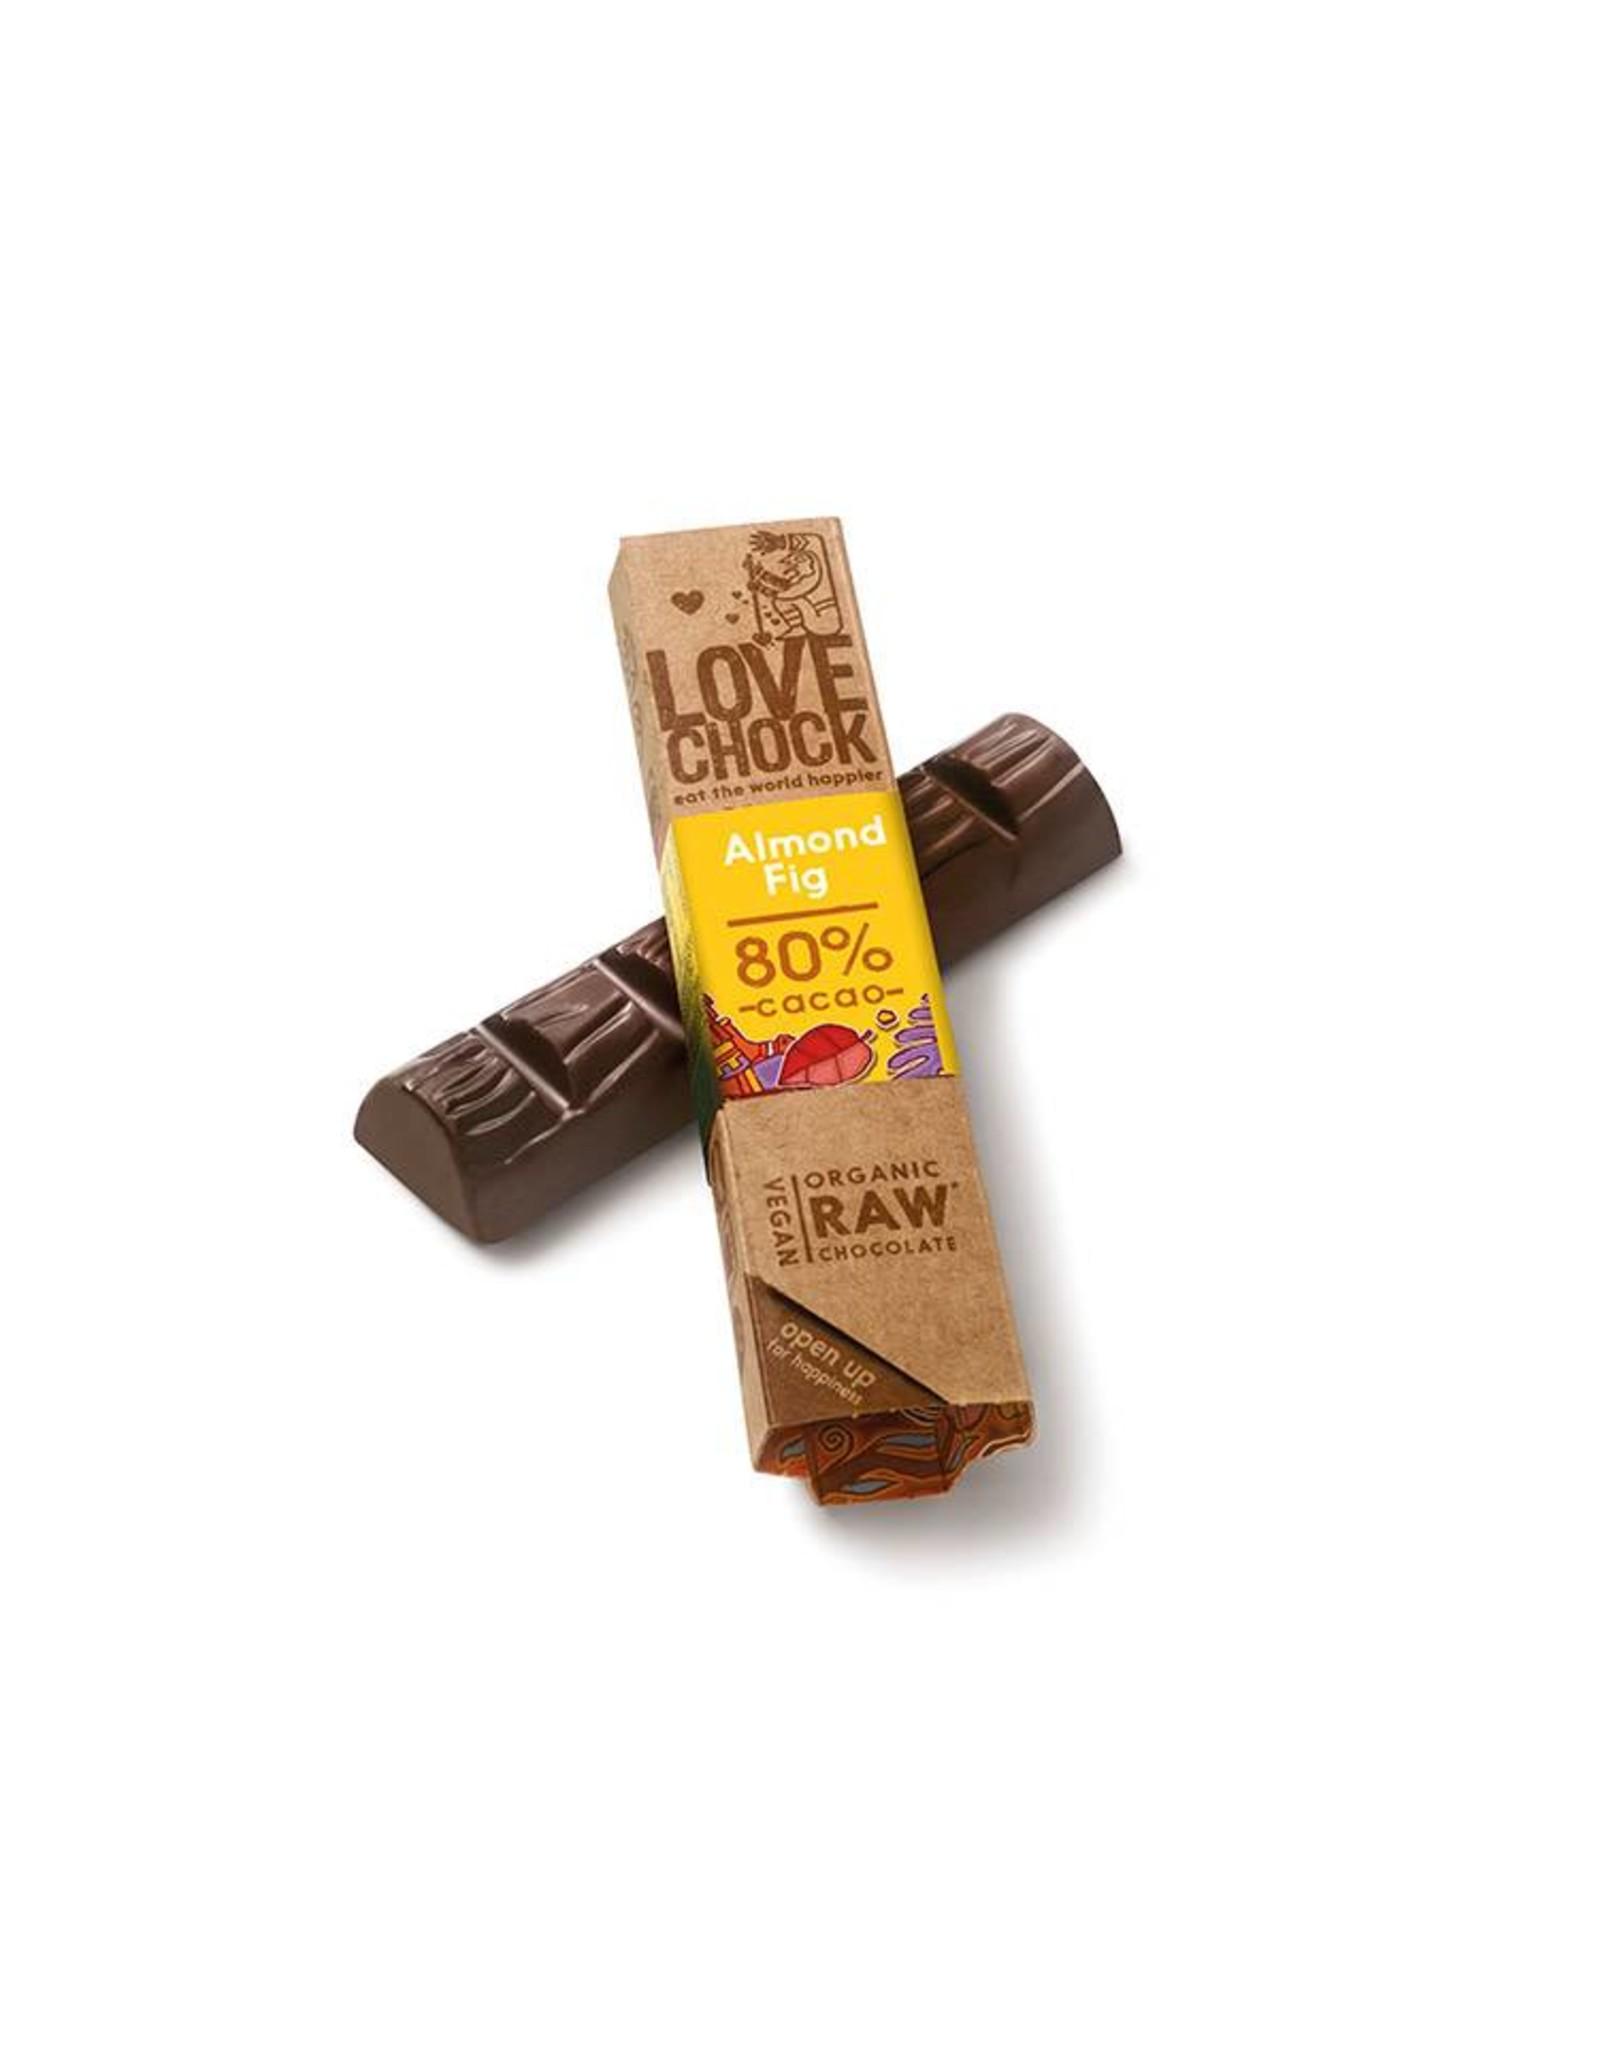 Lovechock Almond Fig Organic Raw Chocolate